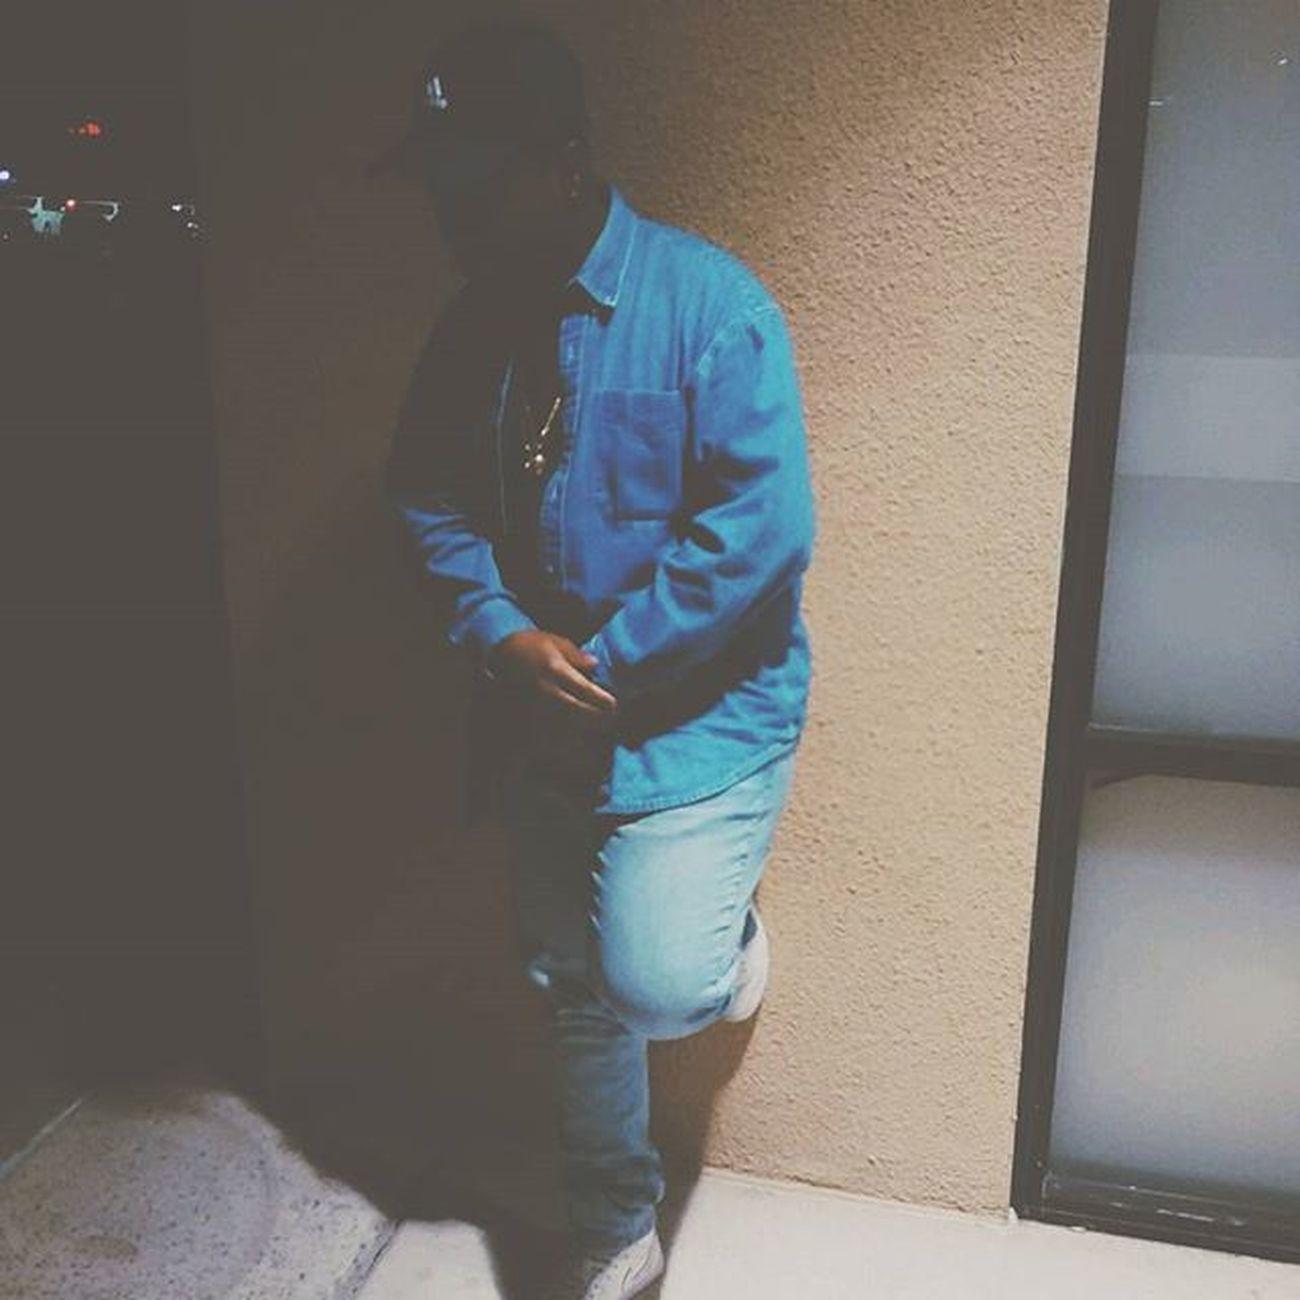 1 9 9 6 - N - 2 0 1 5 Stussy Bape Vintage Supremenyc Supremexjordan Adidas Caps Trill DOPE Crooksandcastles  Cheersclub Air Nike Airmax Nikeswoosh Tillys Sacramento California Cali Sactown Illest Trippy Streetwear Streetfashion Mensfashion